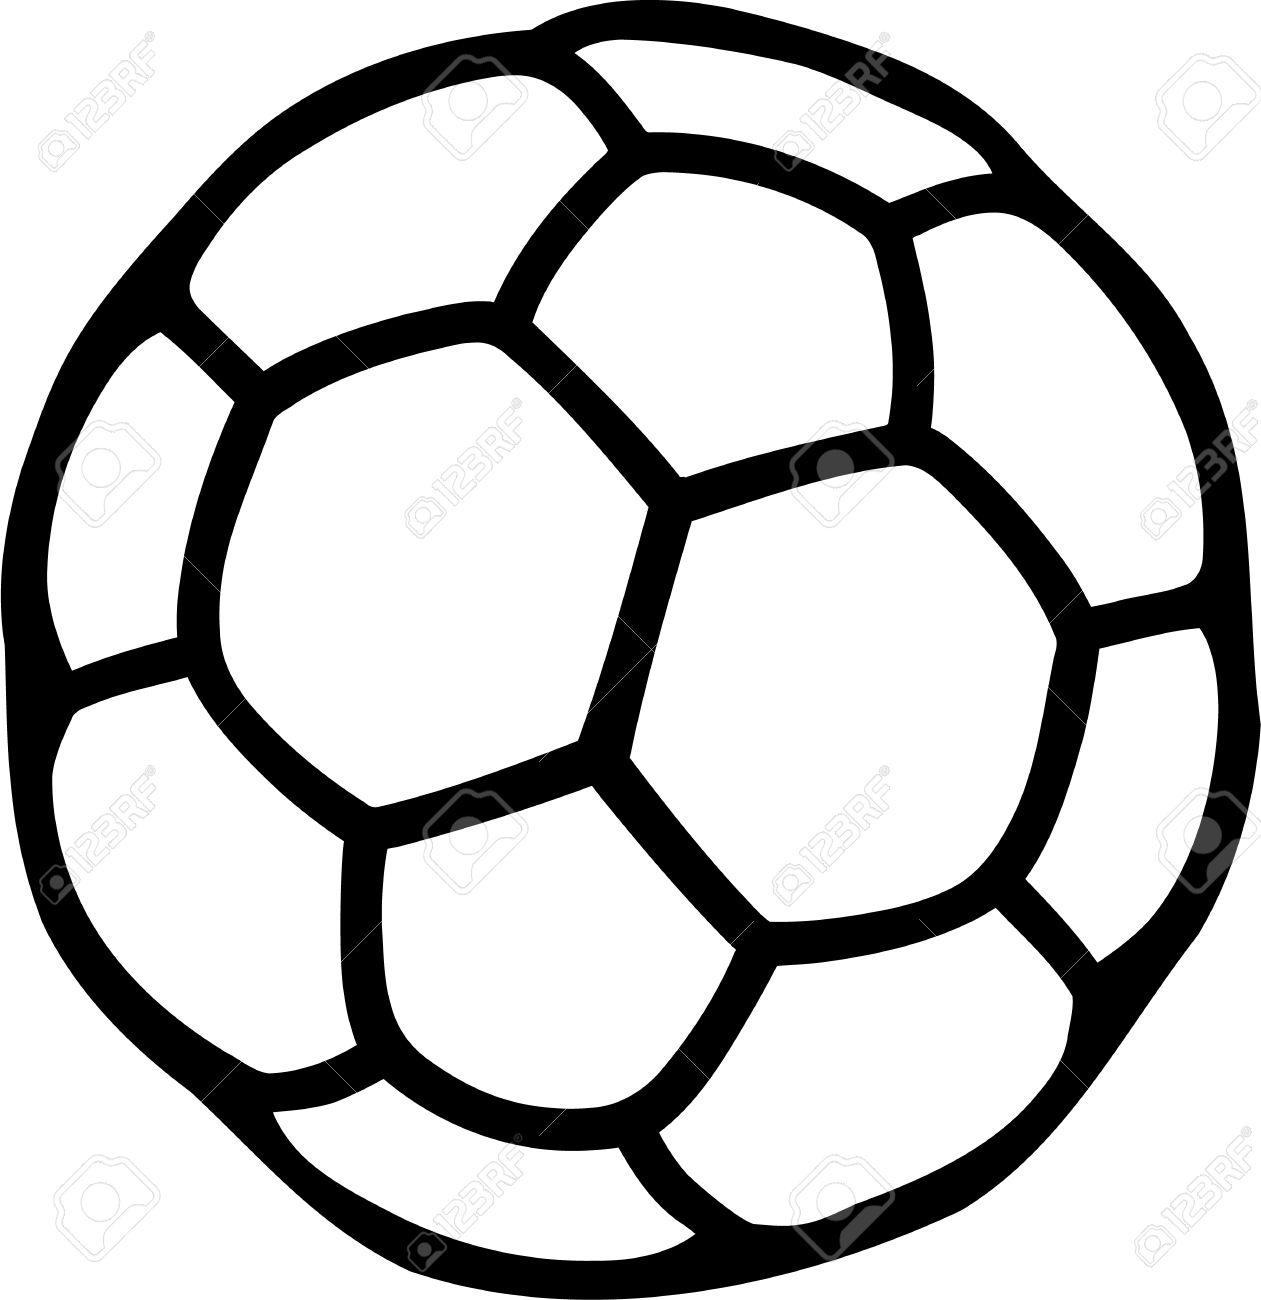 Handball Ball Pictogram Royalty Free Cliparts Vectors And Stock Illustration Image 40899312